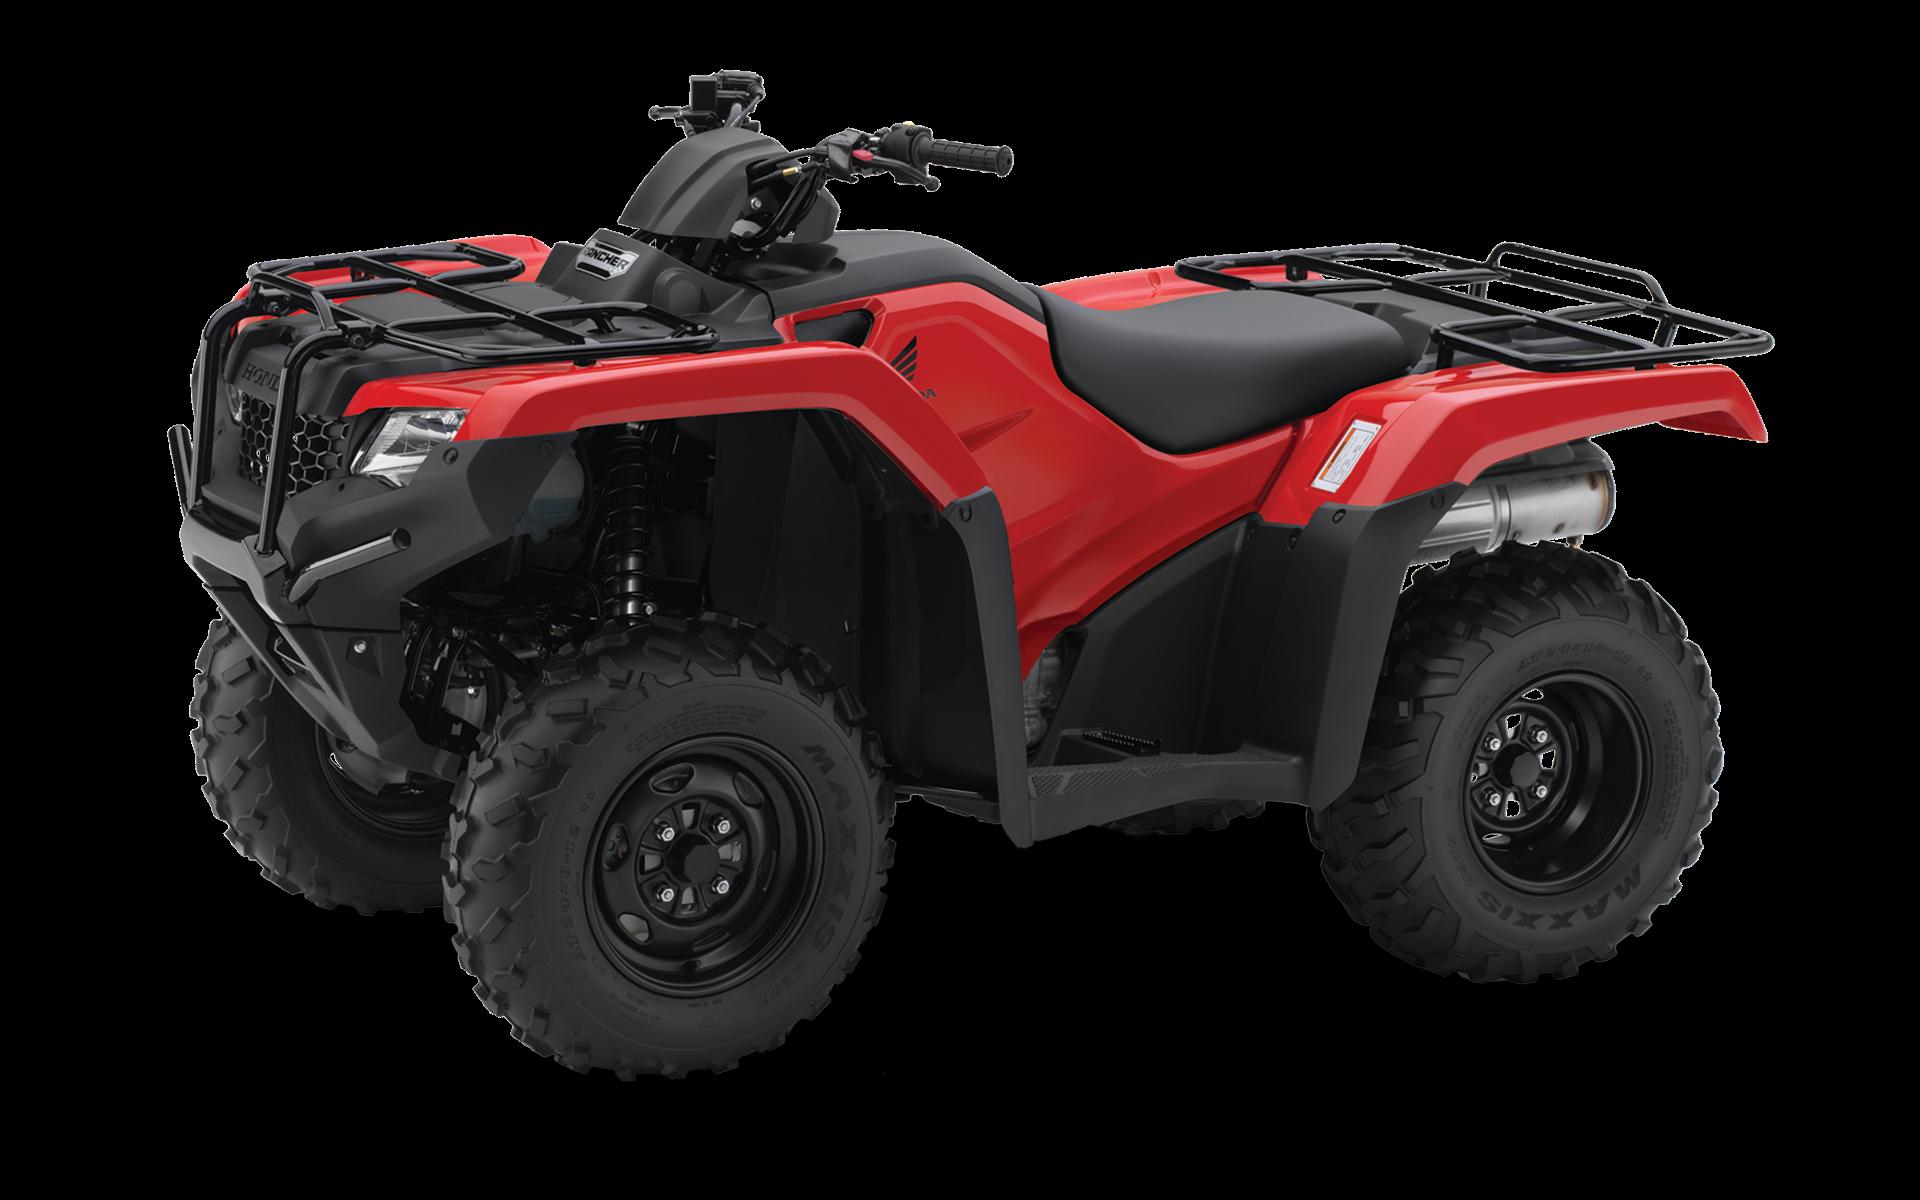 Red TRX420